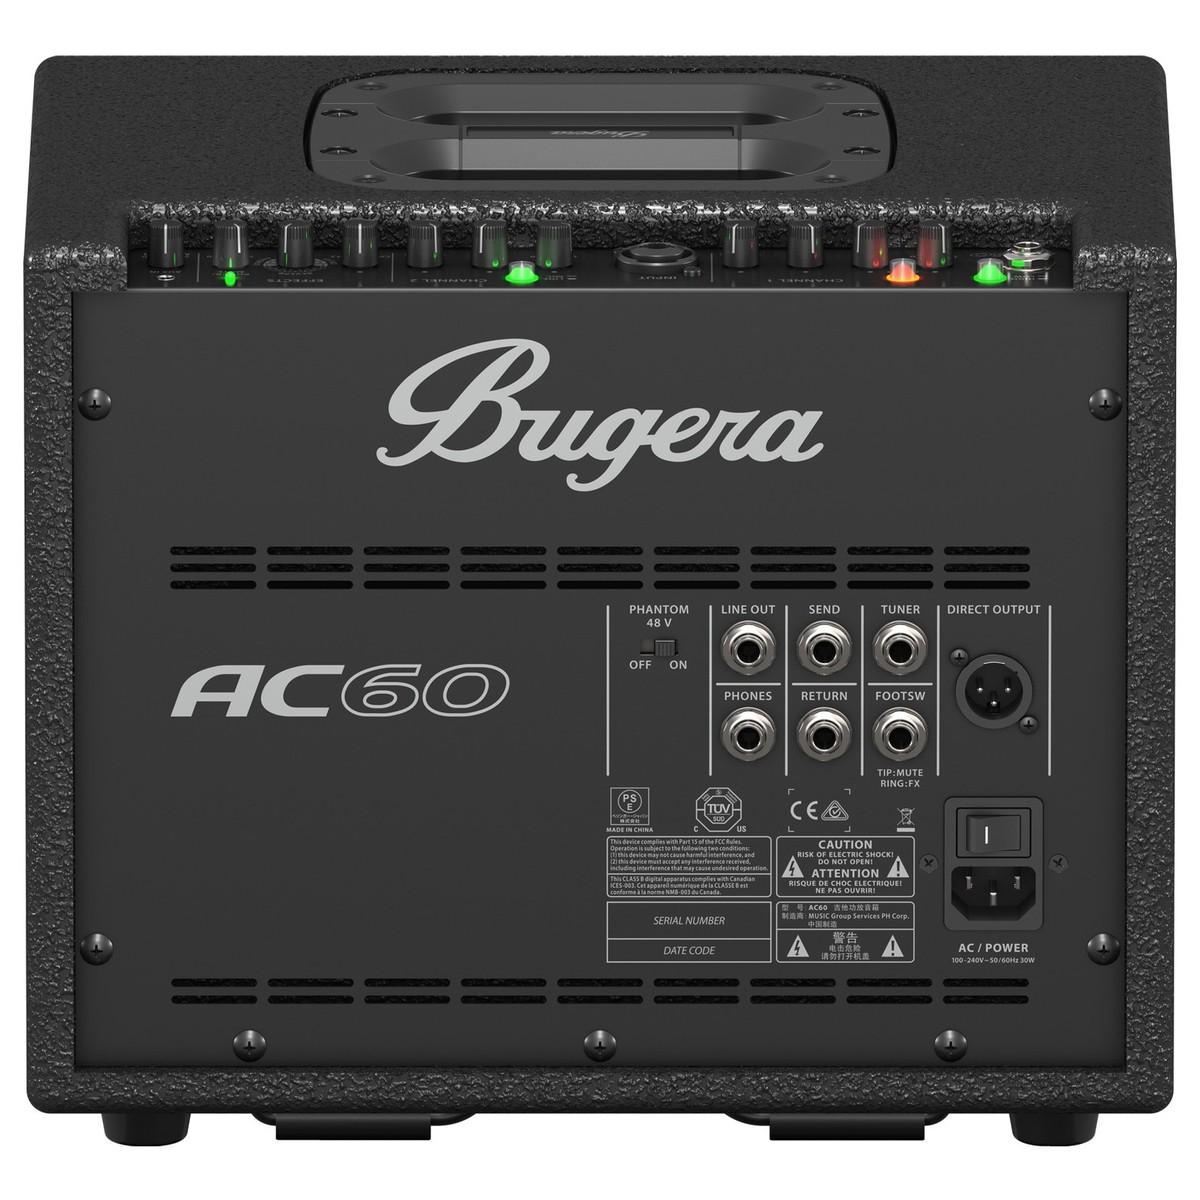 Bugera Ac60 Acoustic Guitar Combo Amp : bugera ac60 60w portable acoustic combo amp at gear4music ~ Vivirlamusica.com Haus und Dekorationen